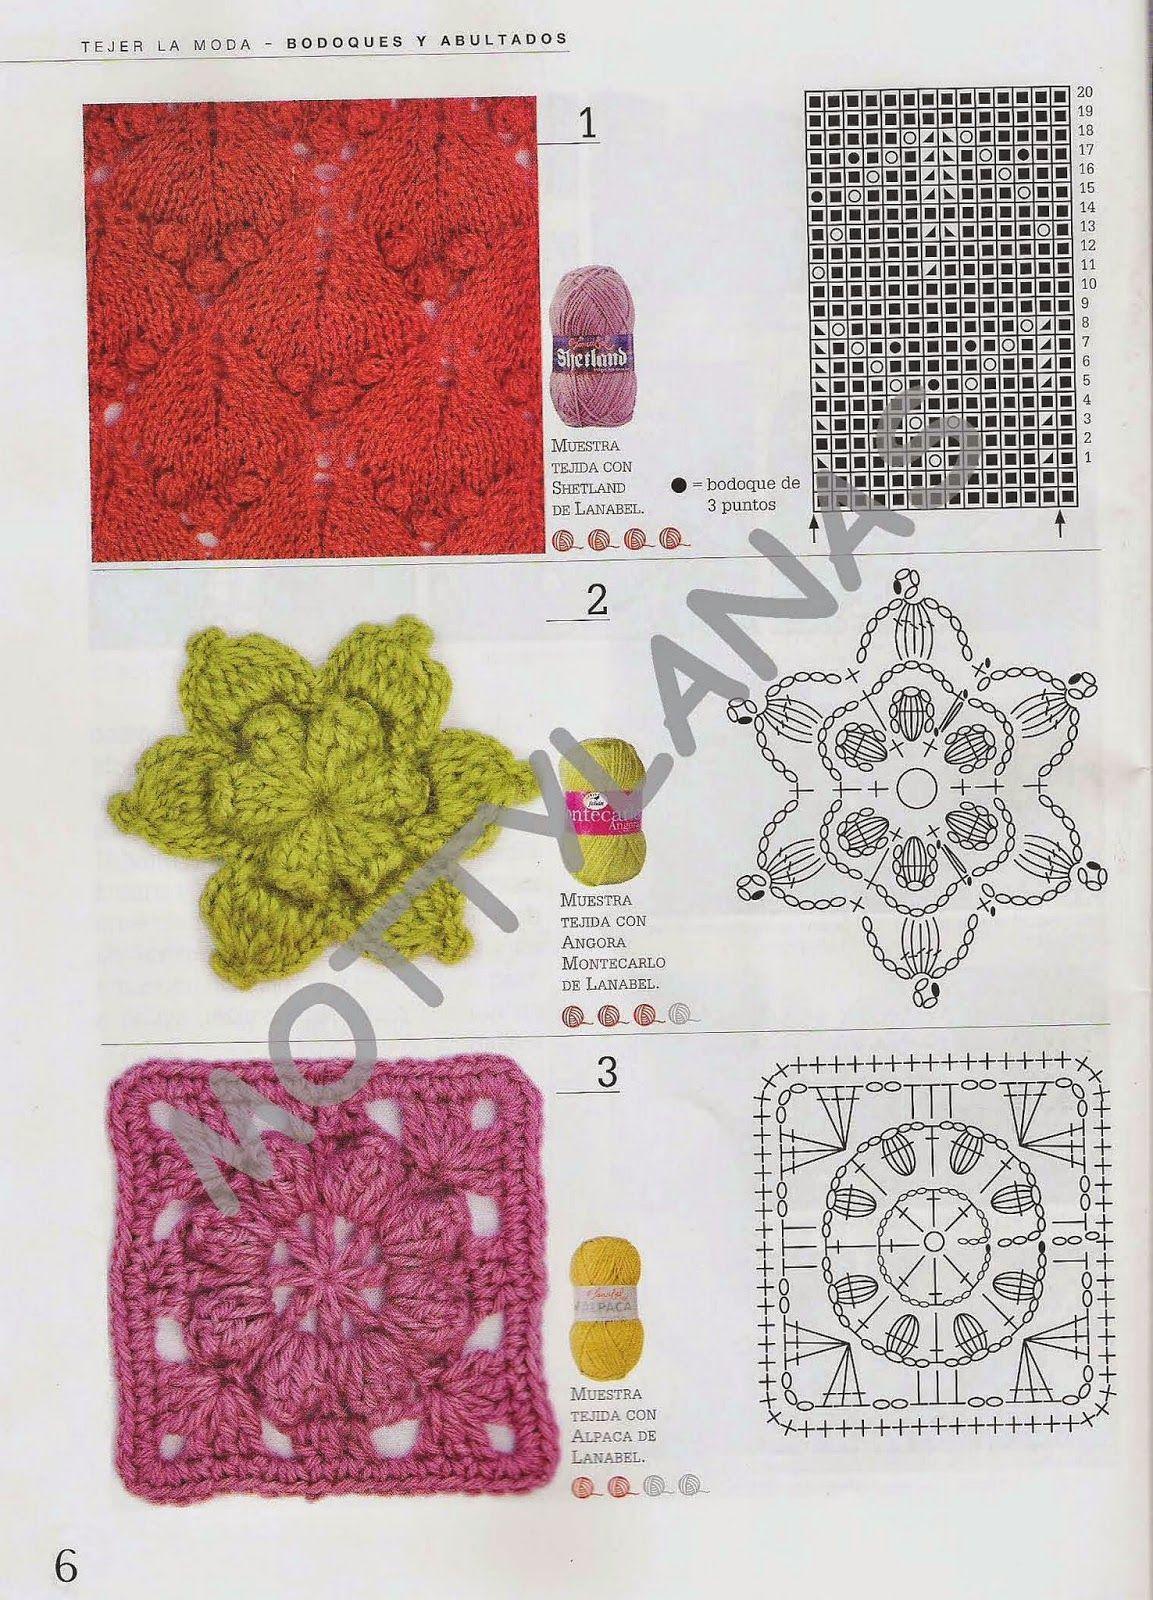 Pin de Saima en crochet ideas 05 | Pinterest | Abultado, Ganchillo y ...